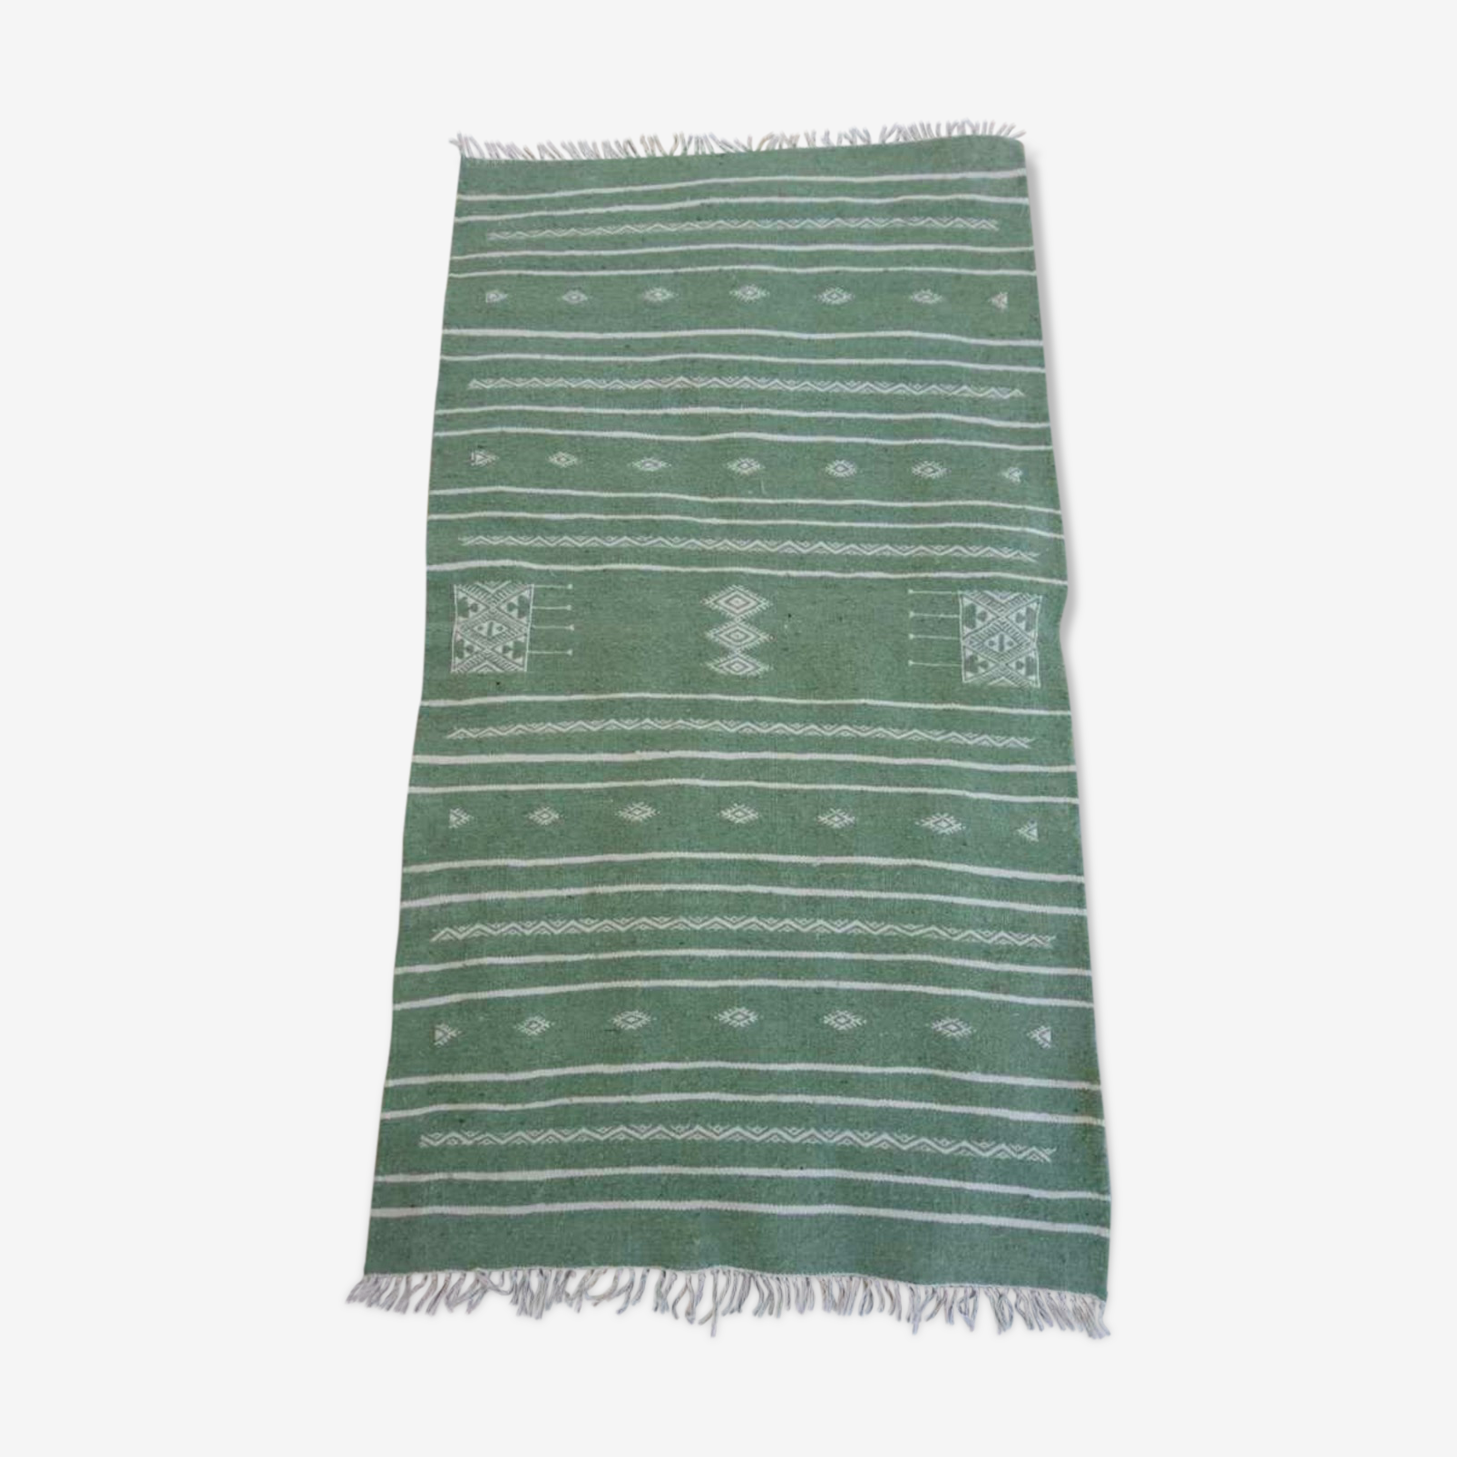 Green Berber Kilim in pure wool 110x63cm